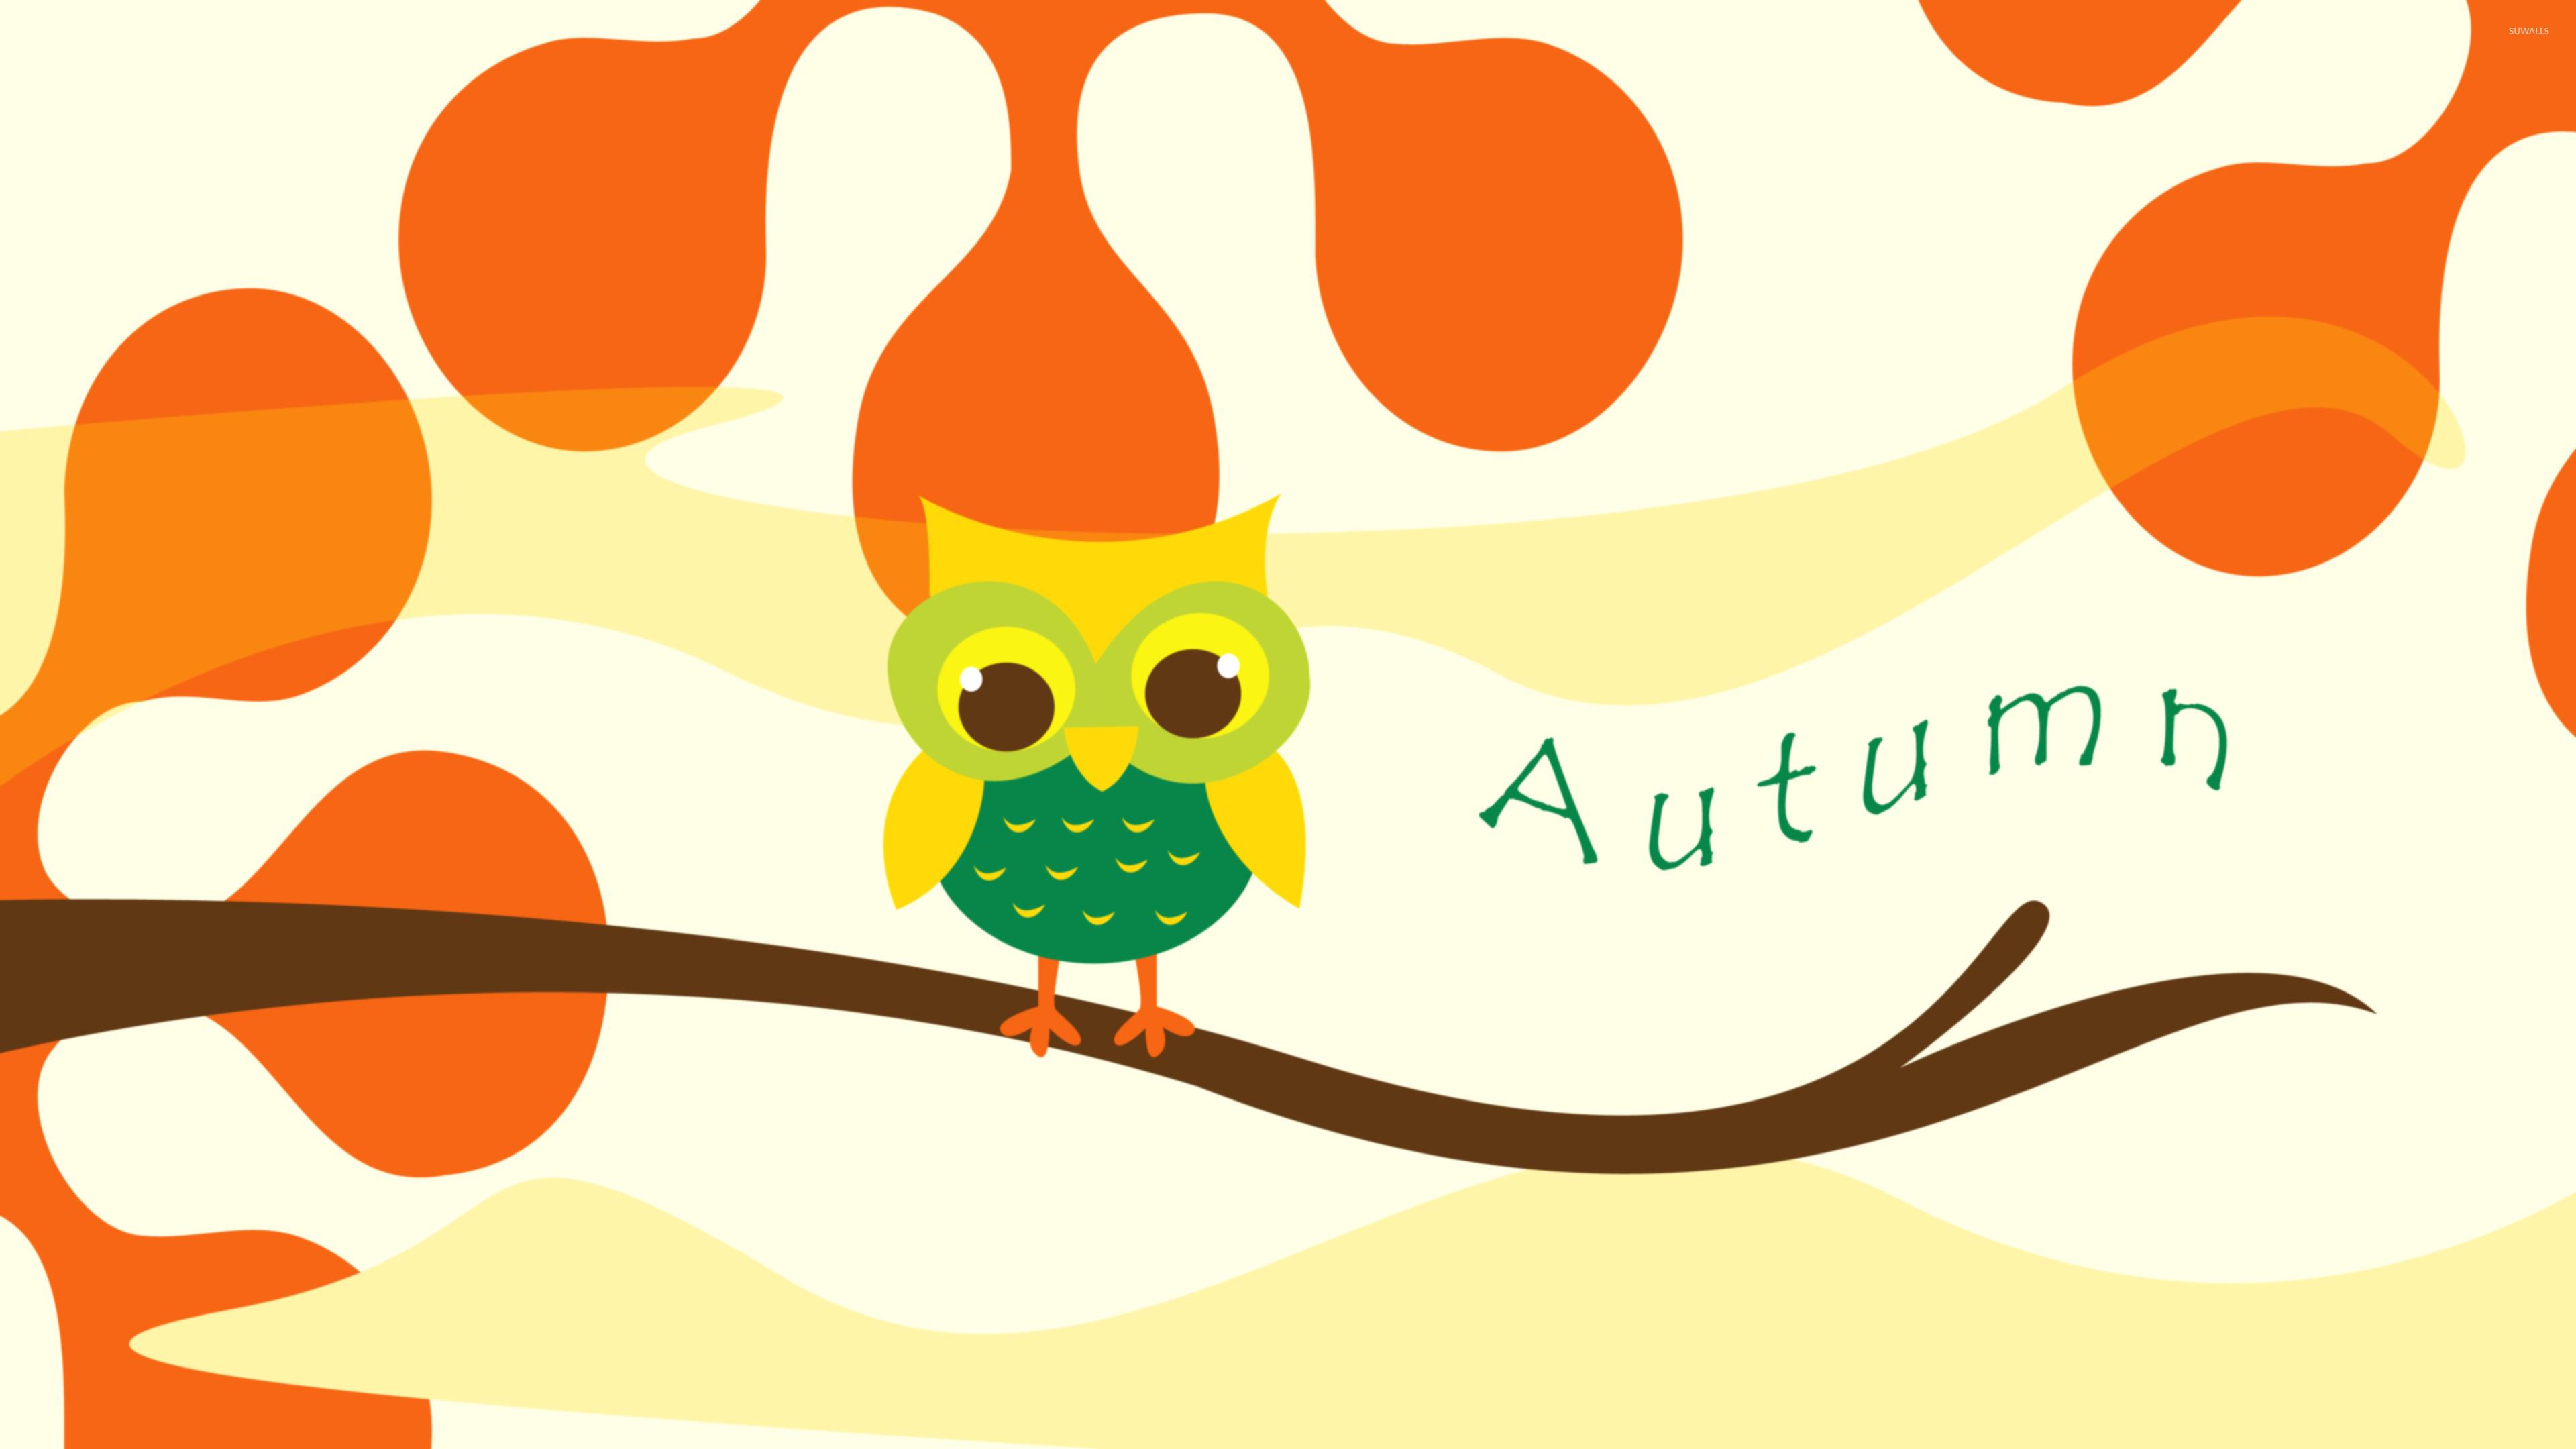 Cute owl wallpapers 65 images 1920x1080 cute owl desktop wallpaper voltagebd Gallery